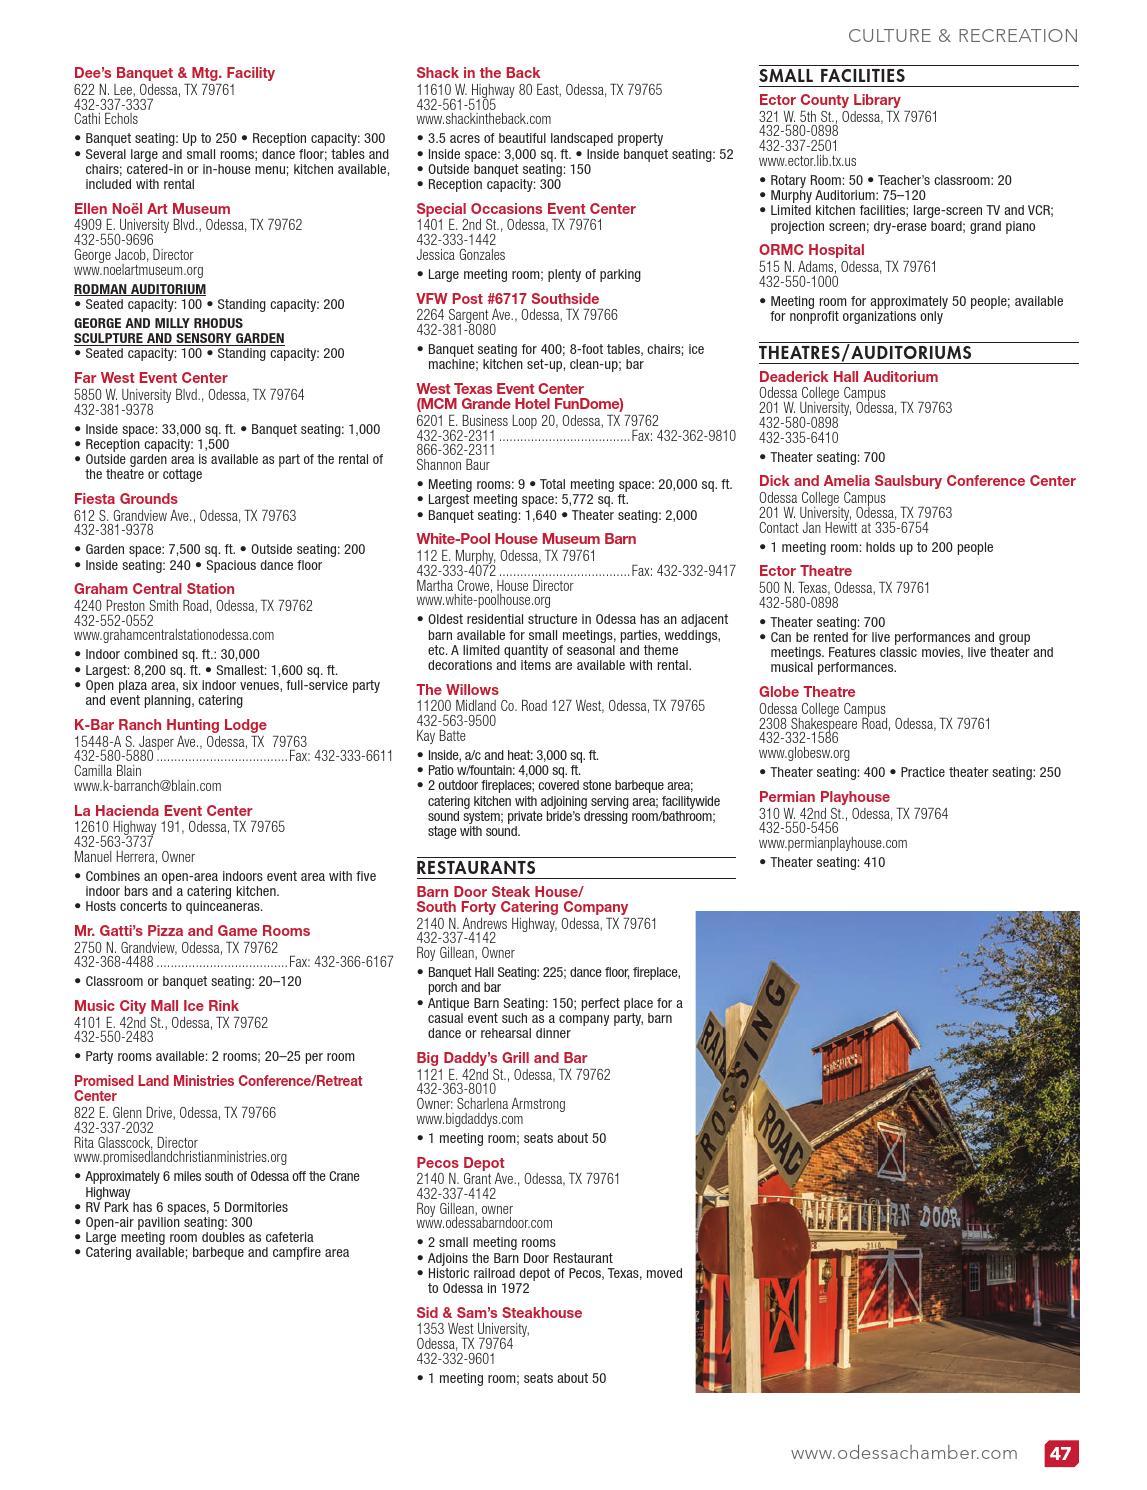 Odessa Tx 2014 Community Profile And Resource Guide By Tivoli